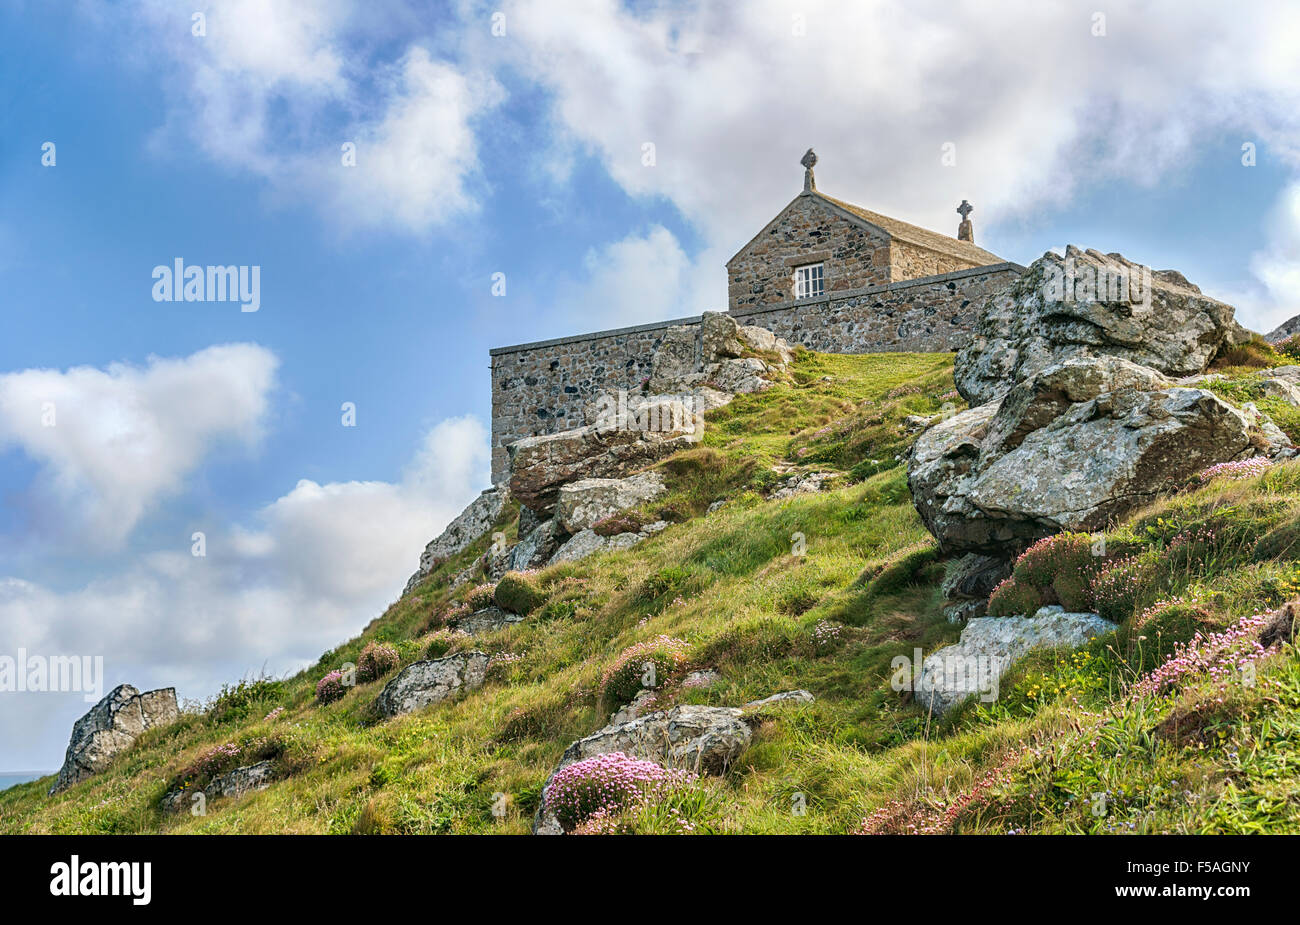 Ancient Chapel of St.Nicholas at The Island Peninsula, St.Ives, Cornwall, England, UK Stock Photo